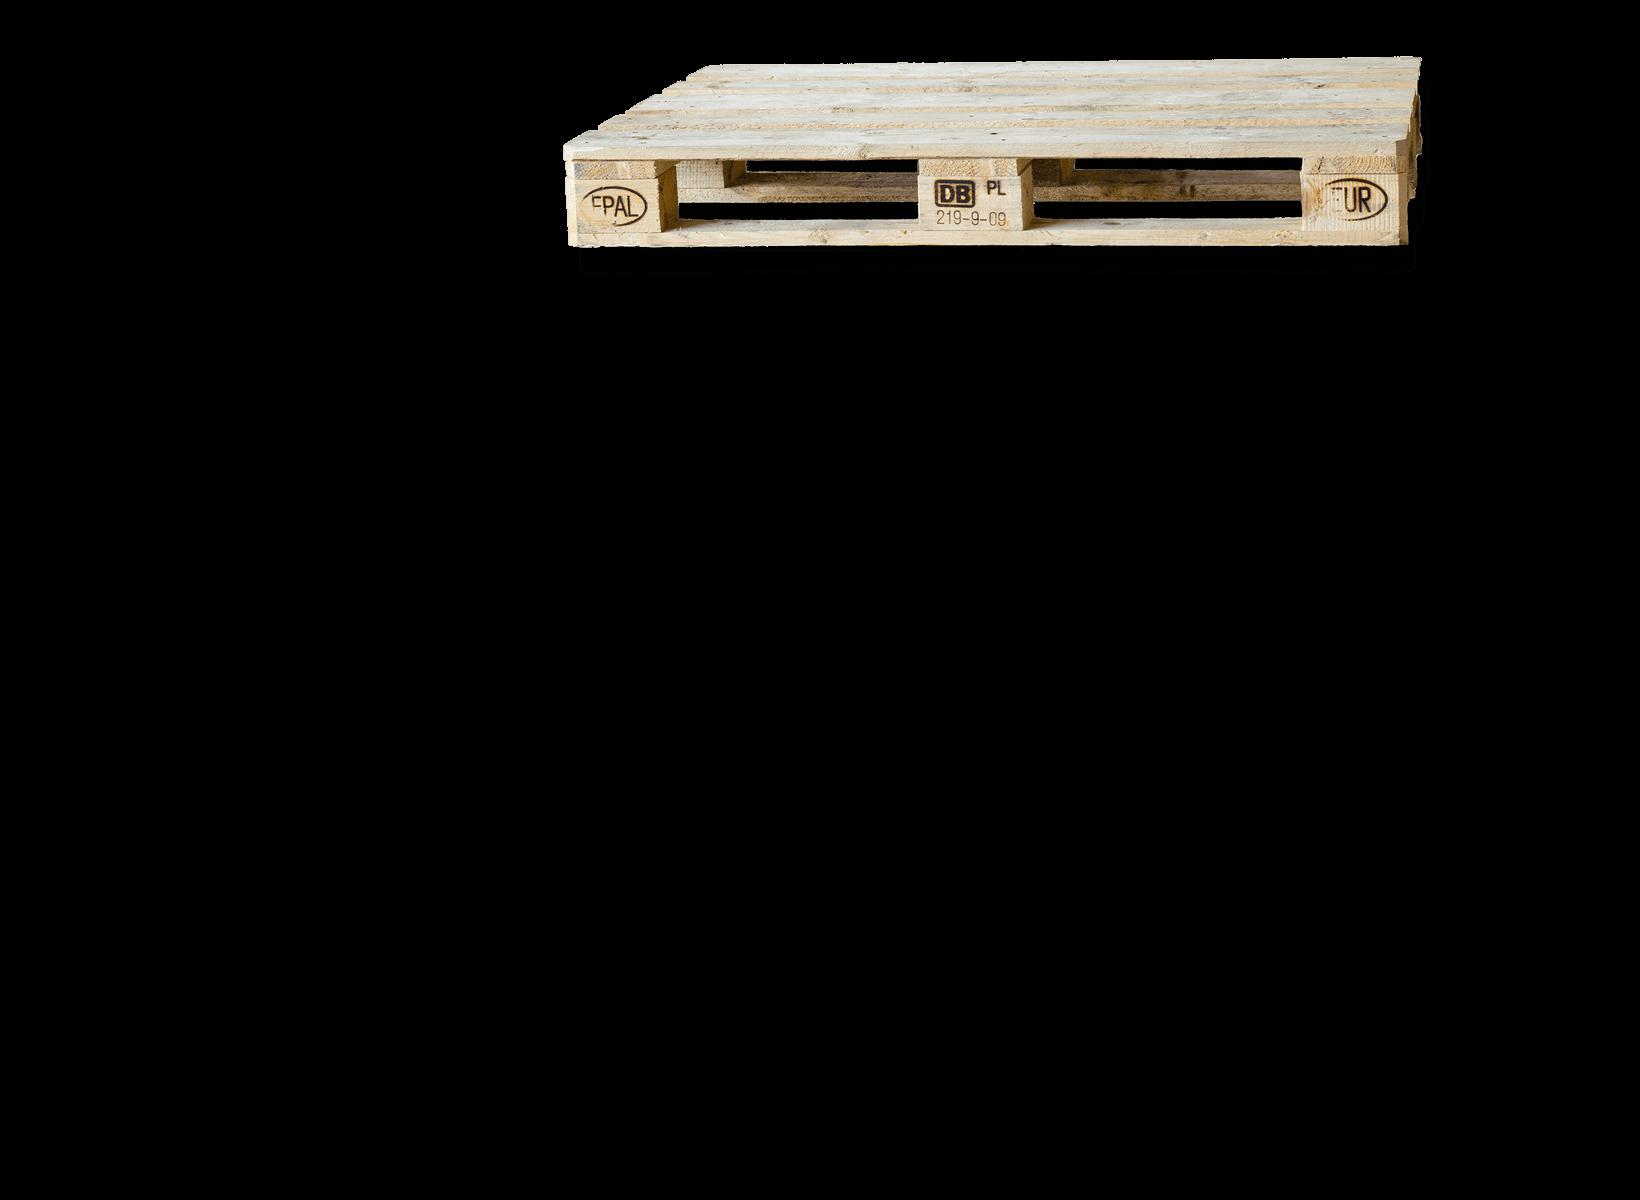 Europalette als Holz quer. Als Illustration unserer Logistik Kompetenzen